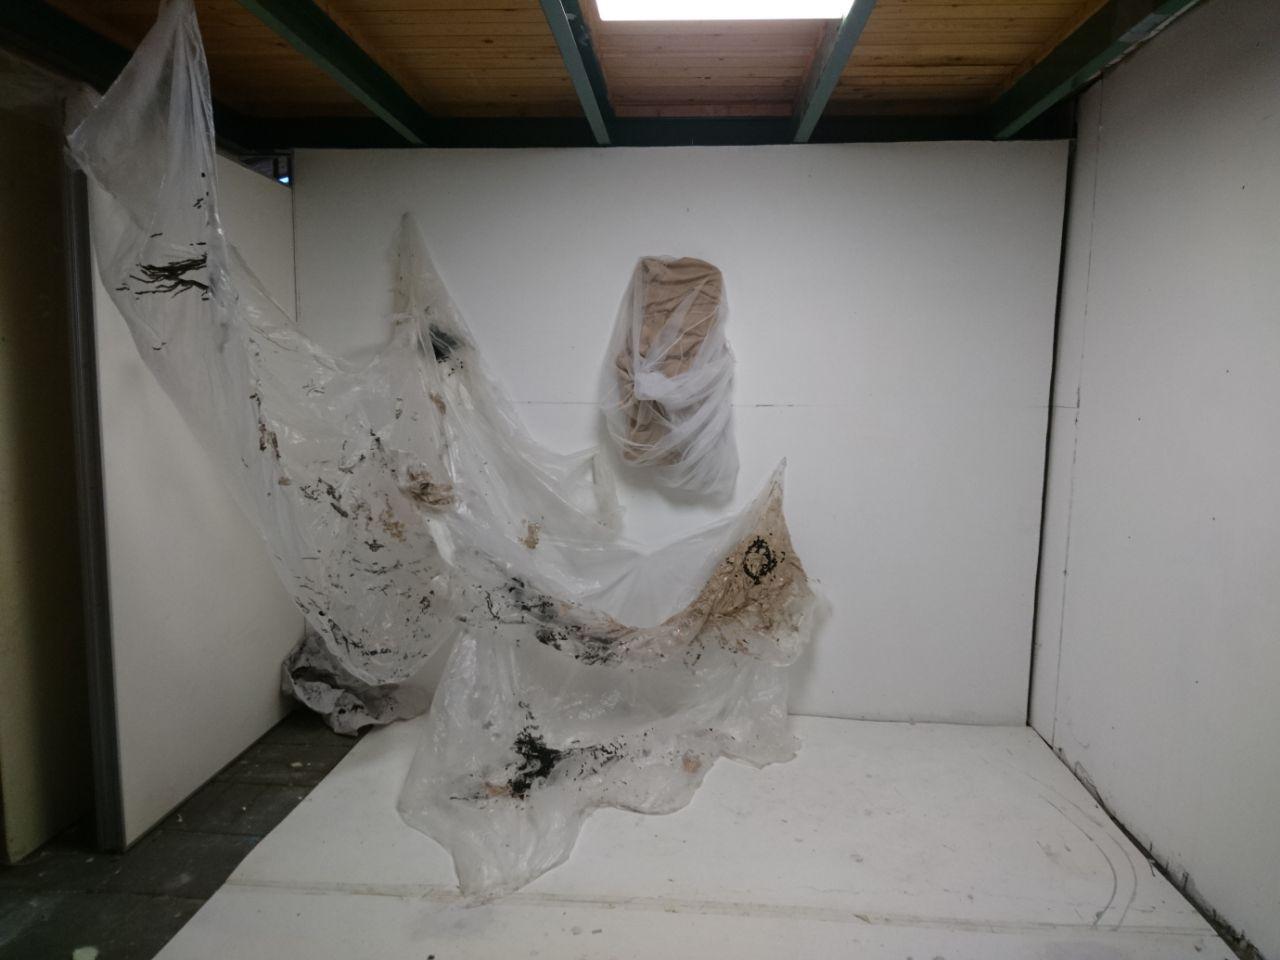 Textile, plastic and paint